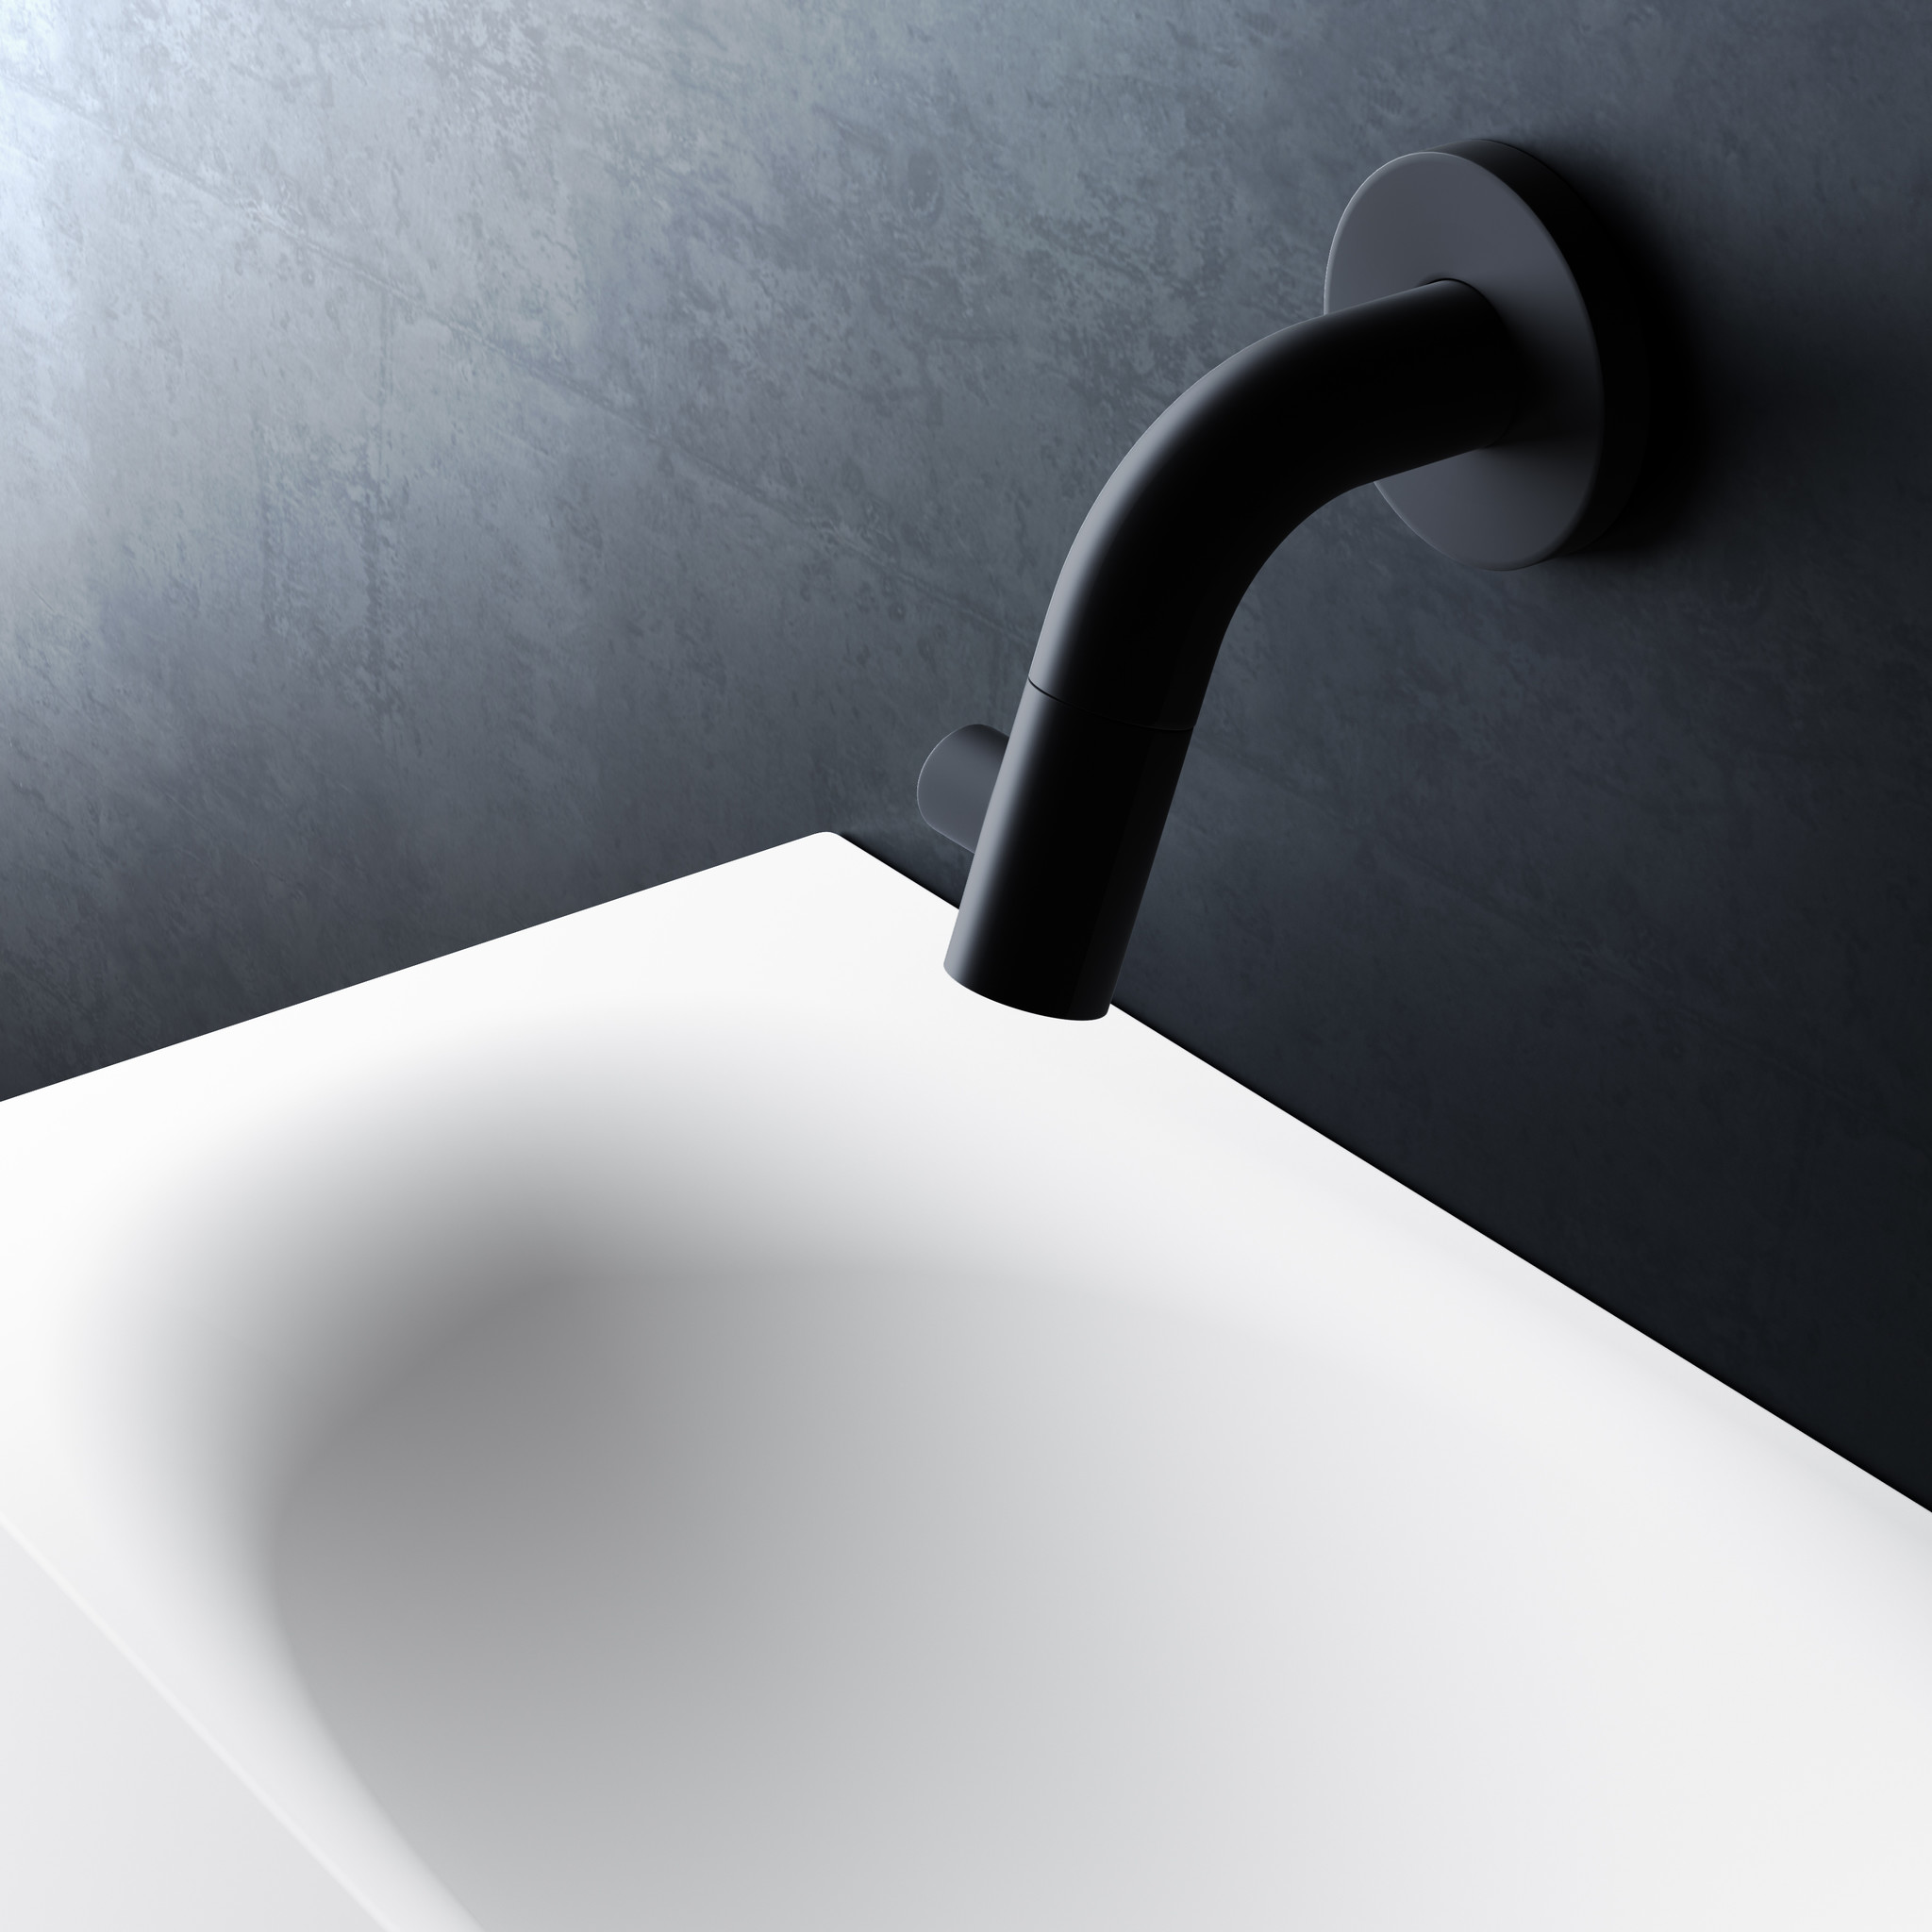 Kaldur cold water tap black